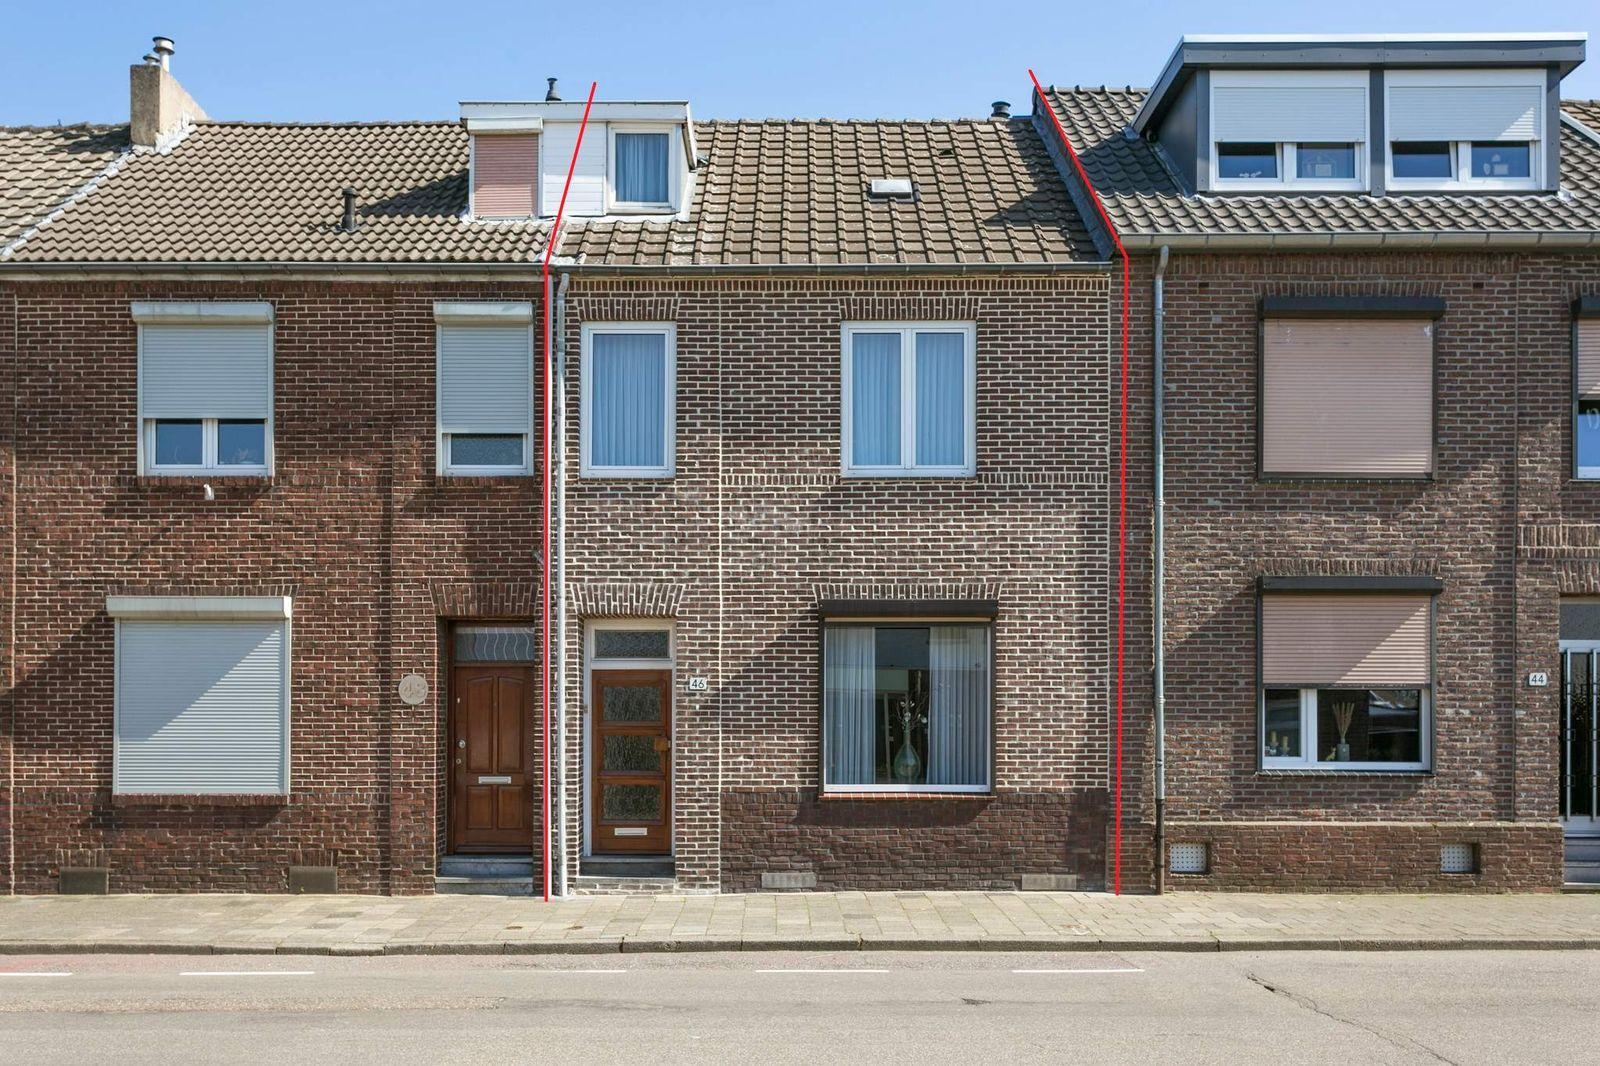 Kruisstraat 46, Kerkrade